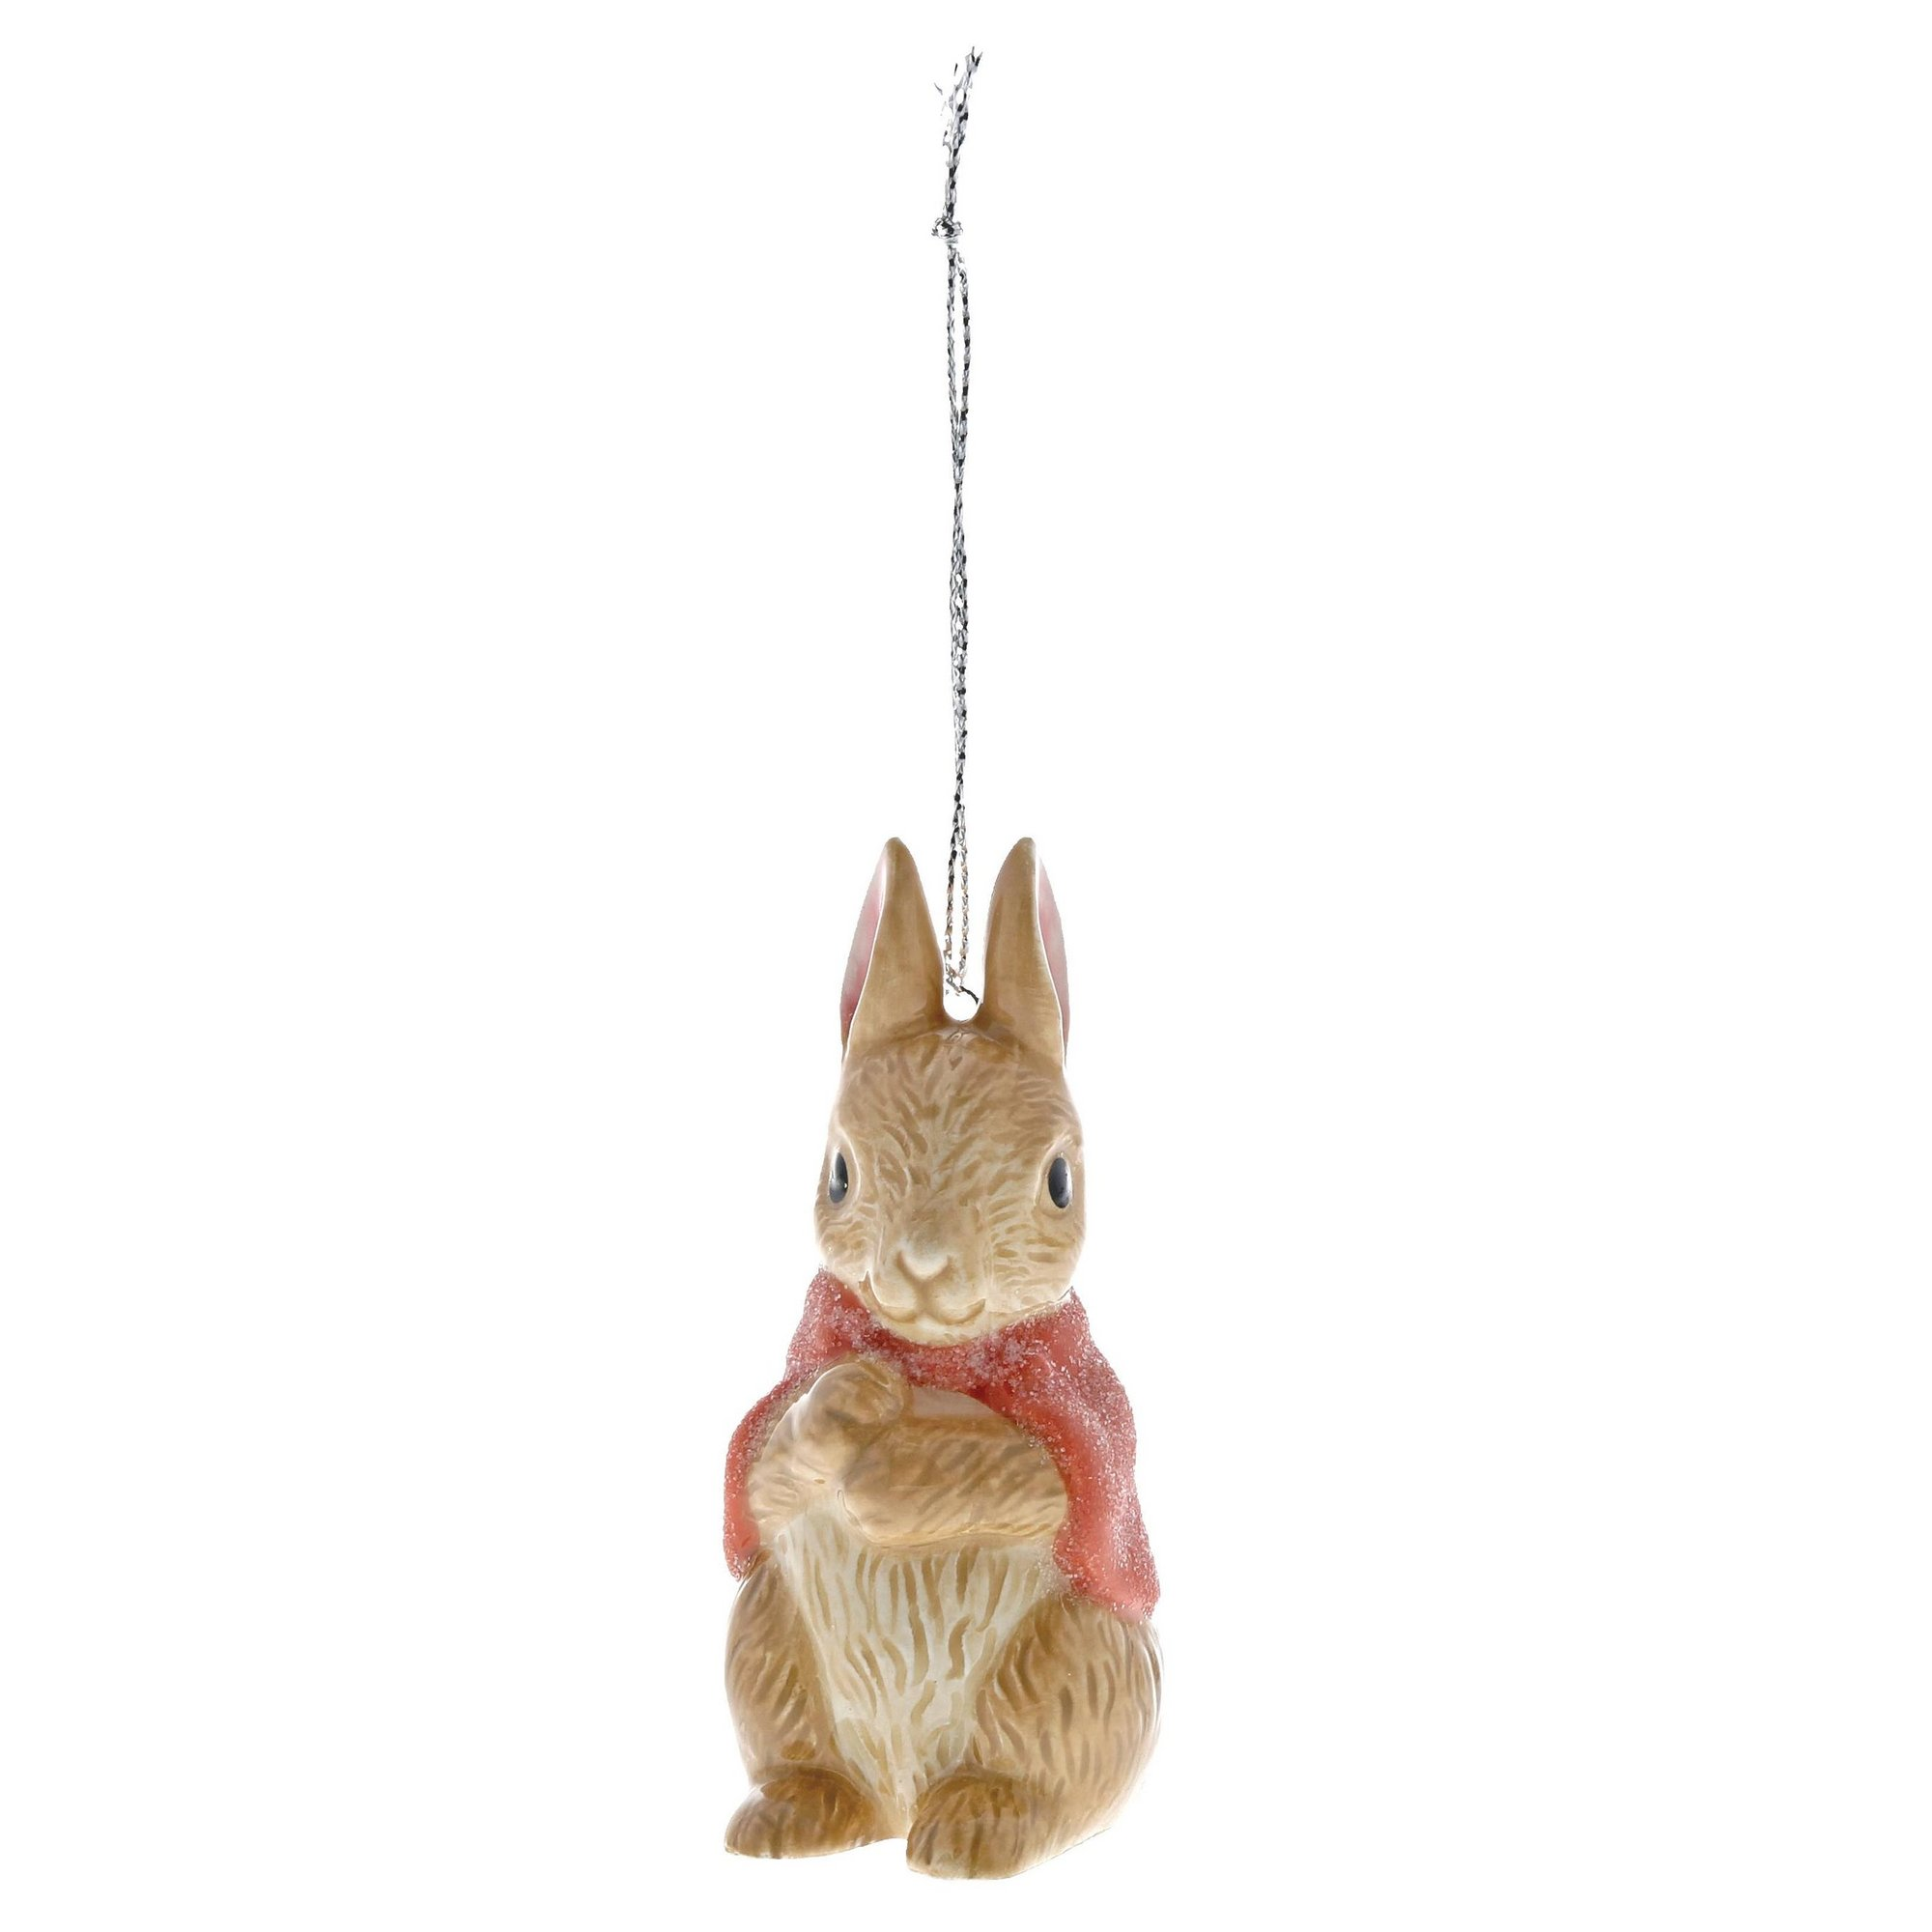 Image of Beatrix Potter Flopsy Hanging Ornament